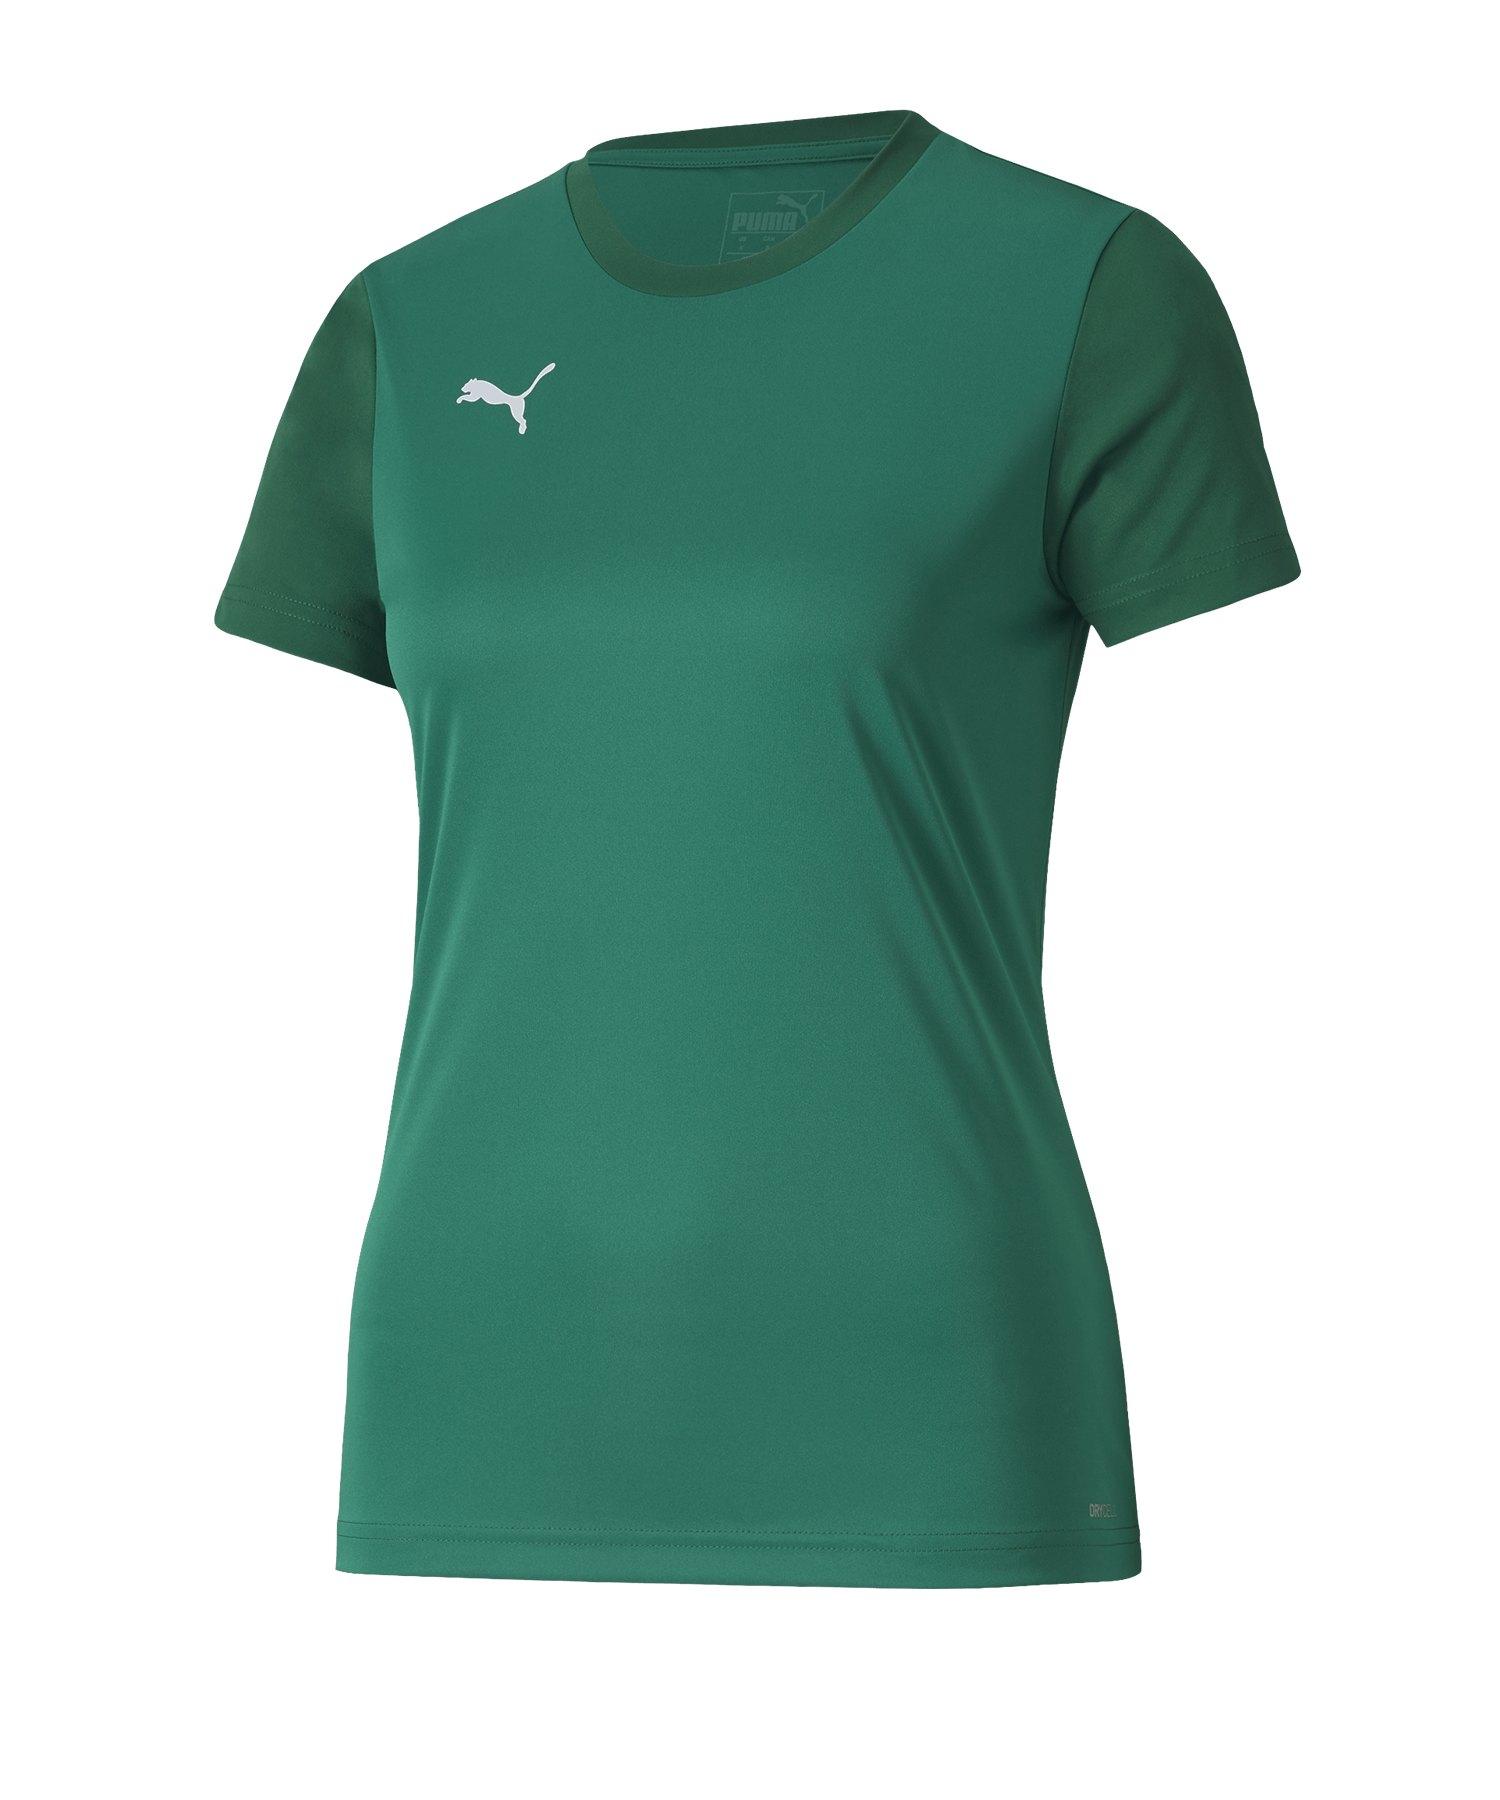 PUMA teamGOAL 23 Sideline Tee T-Shirt Damen F05 - Gruen